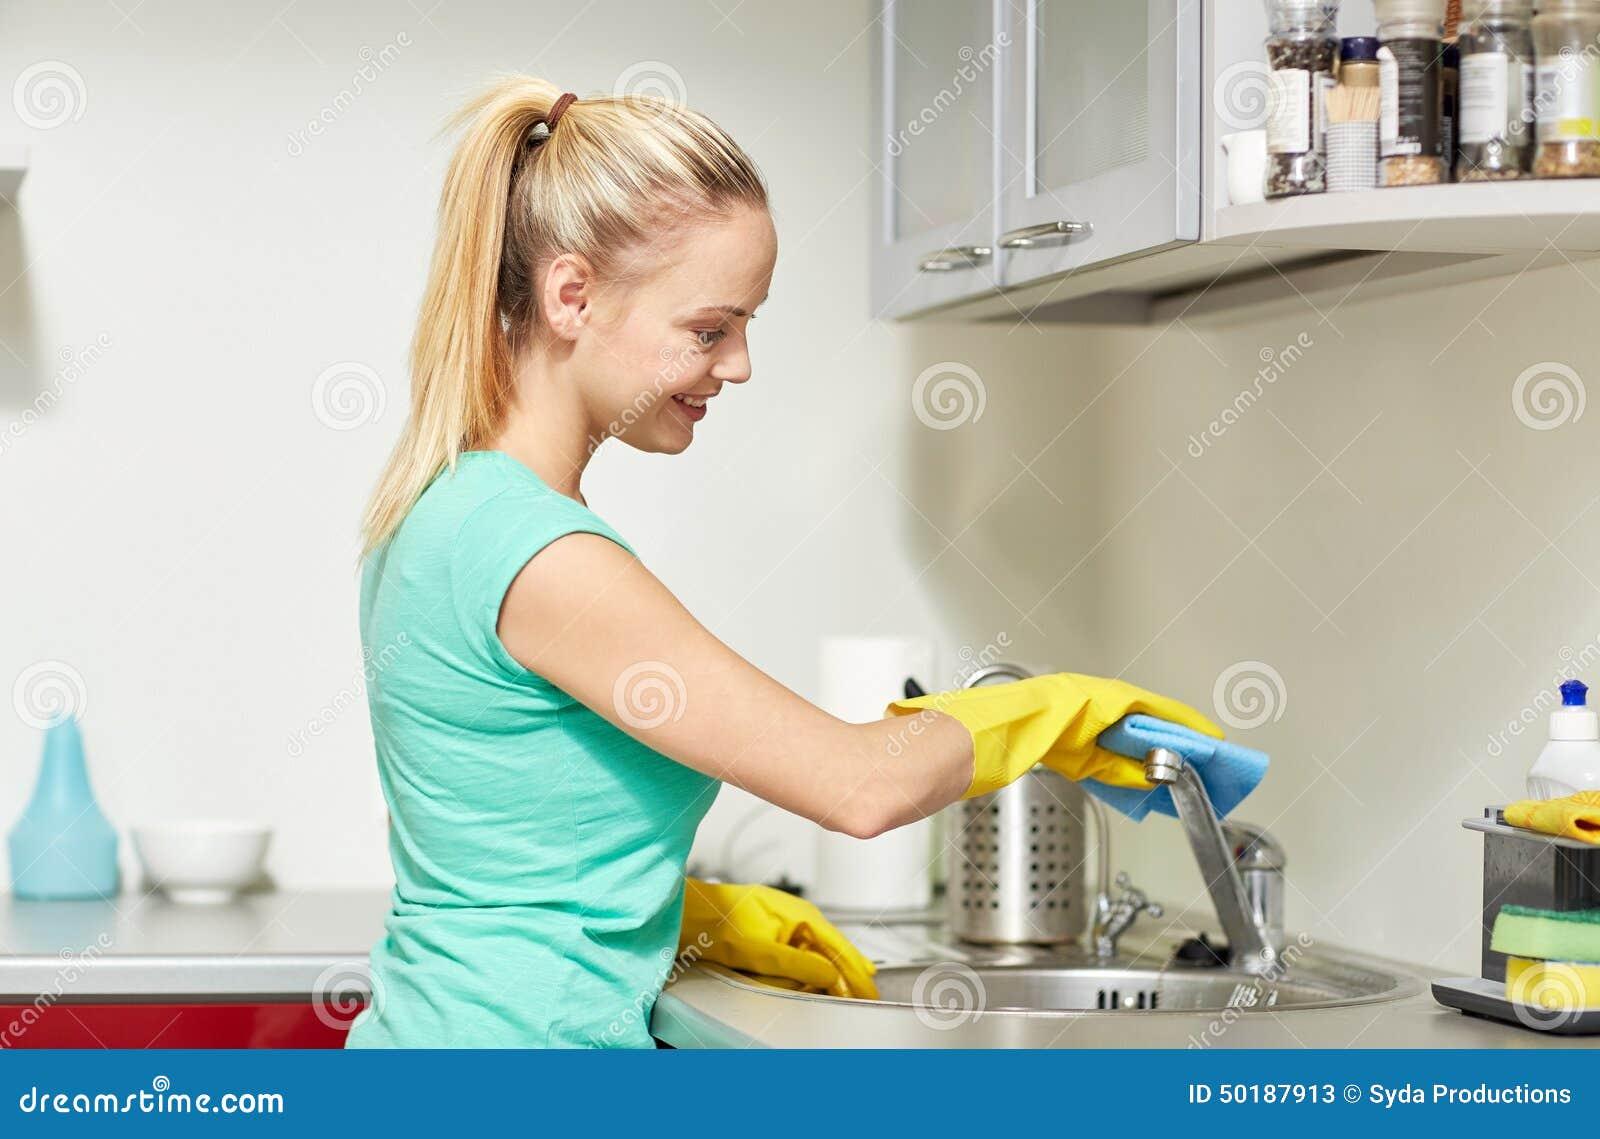 Home Cleaning Cartoon Vector Cartoondealer Com 39161467